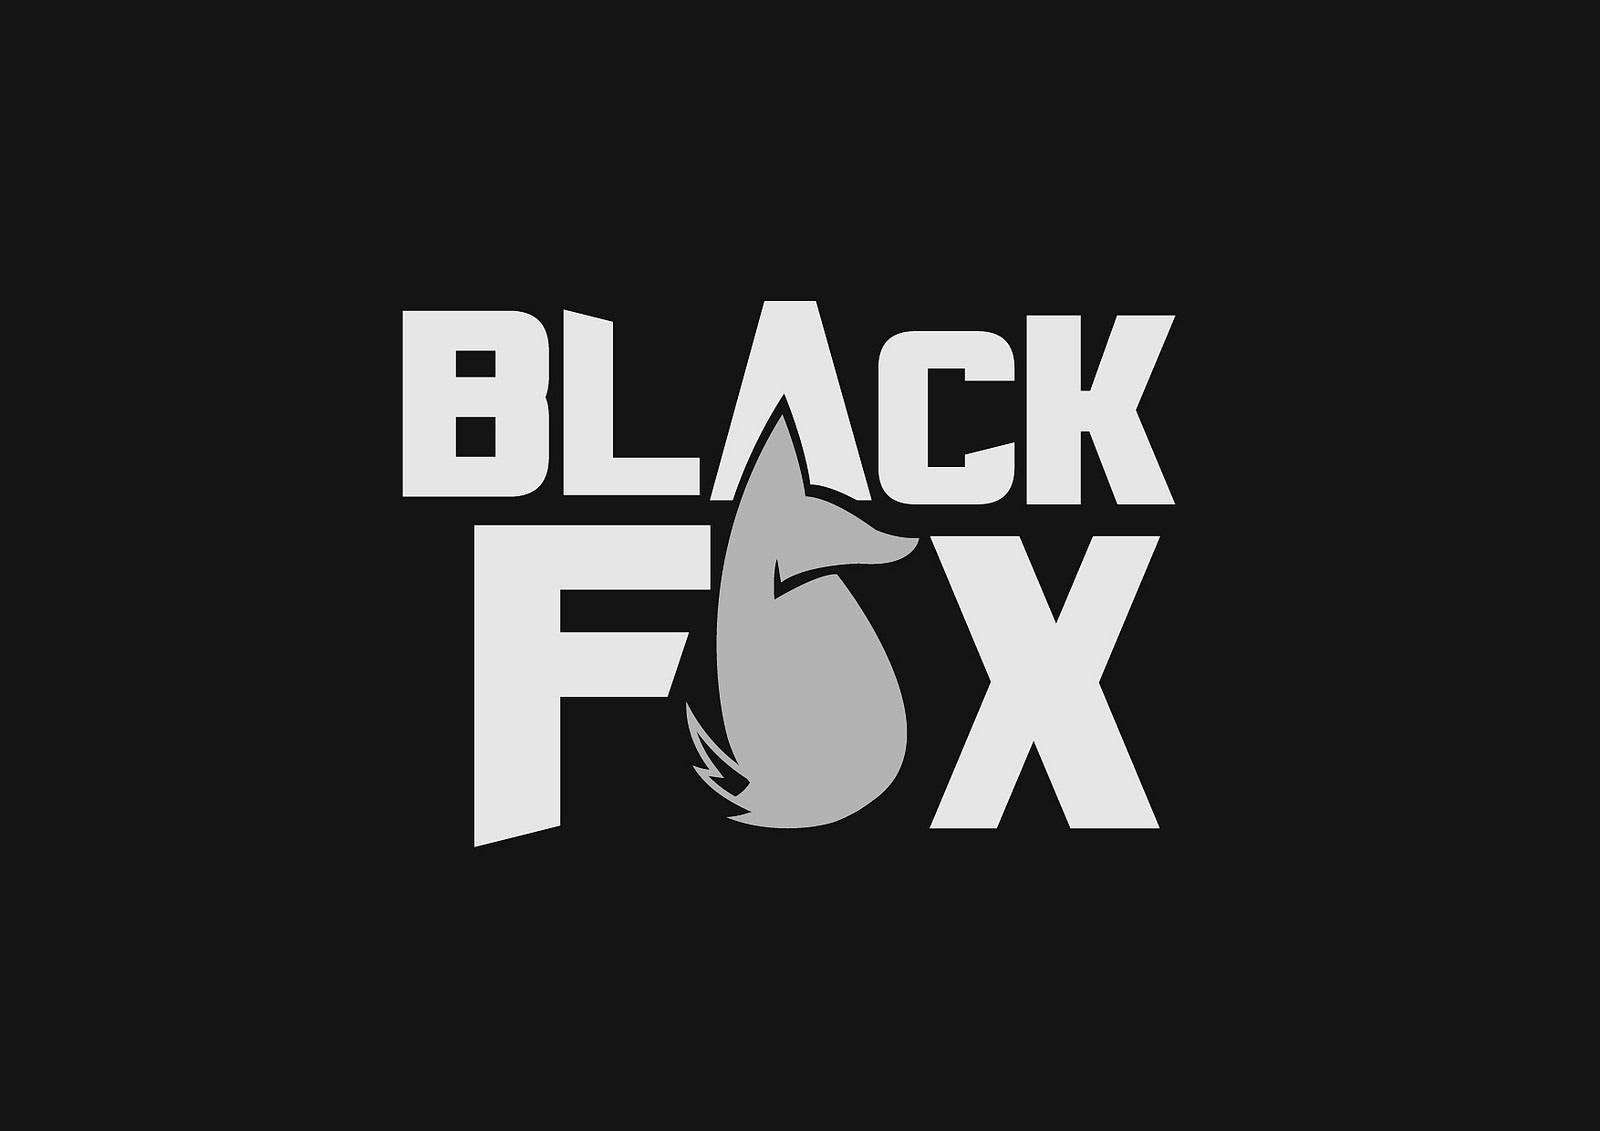 Black Fox logo and branding design